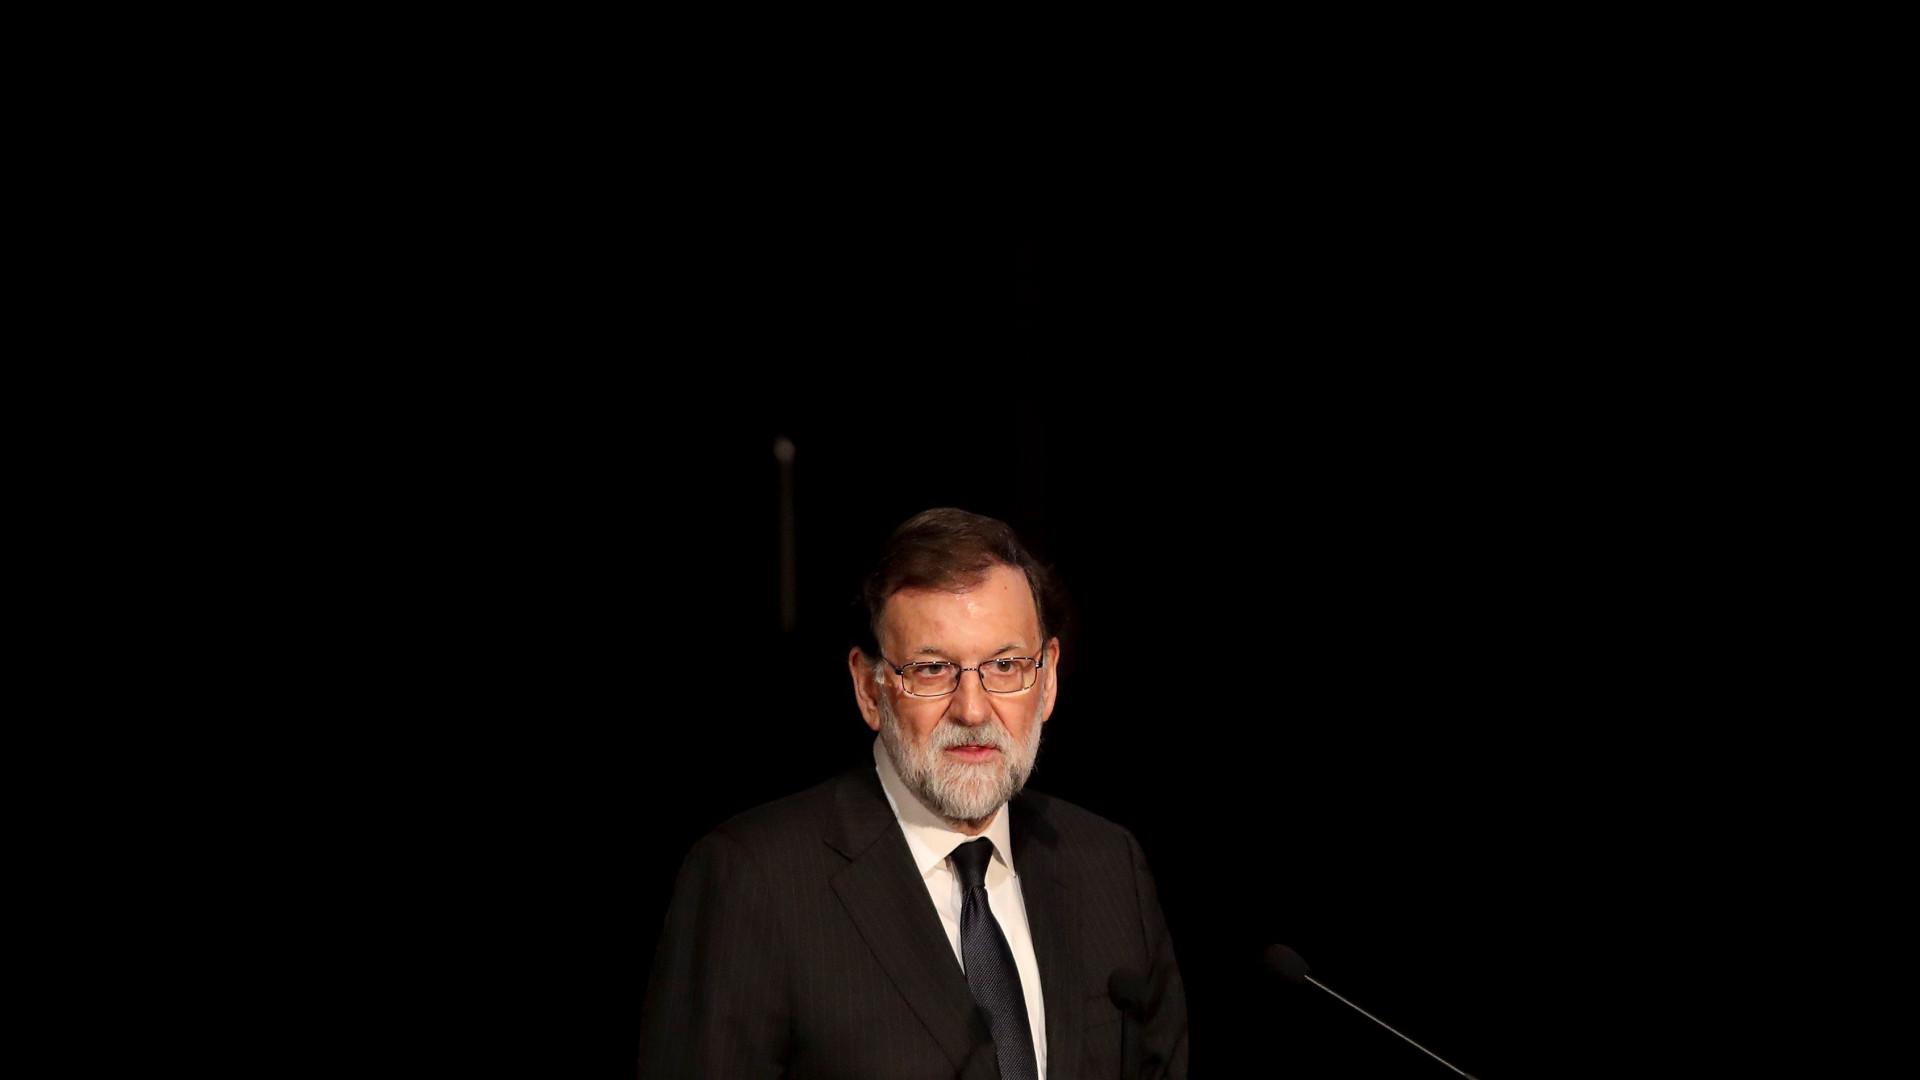 Rajoy quer ver lei cumprida e investidura de Puigdemont impedida